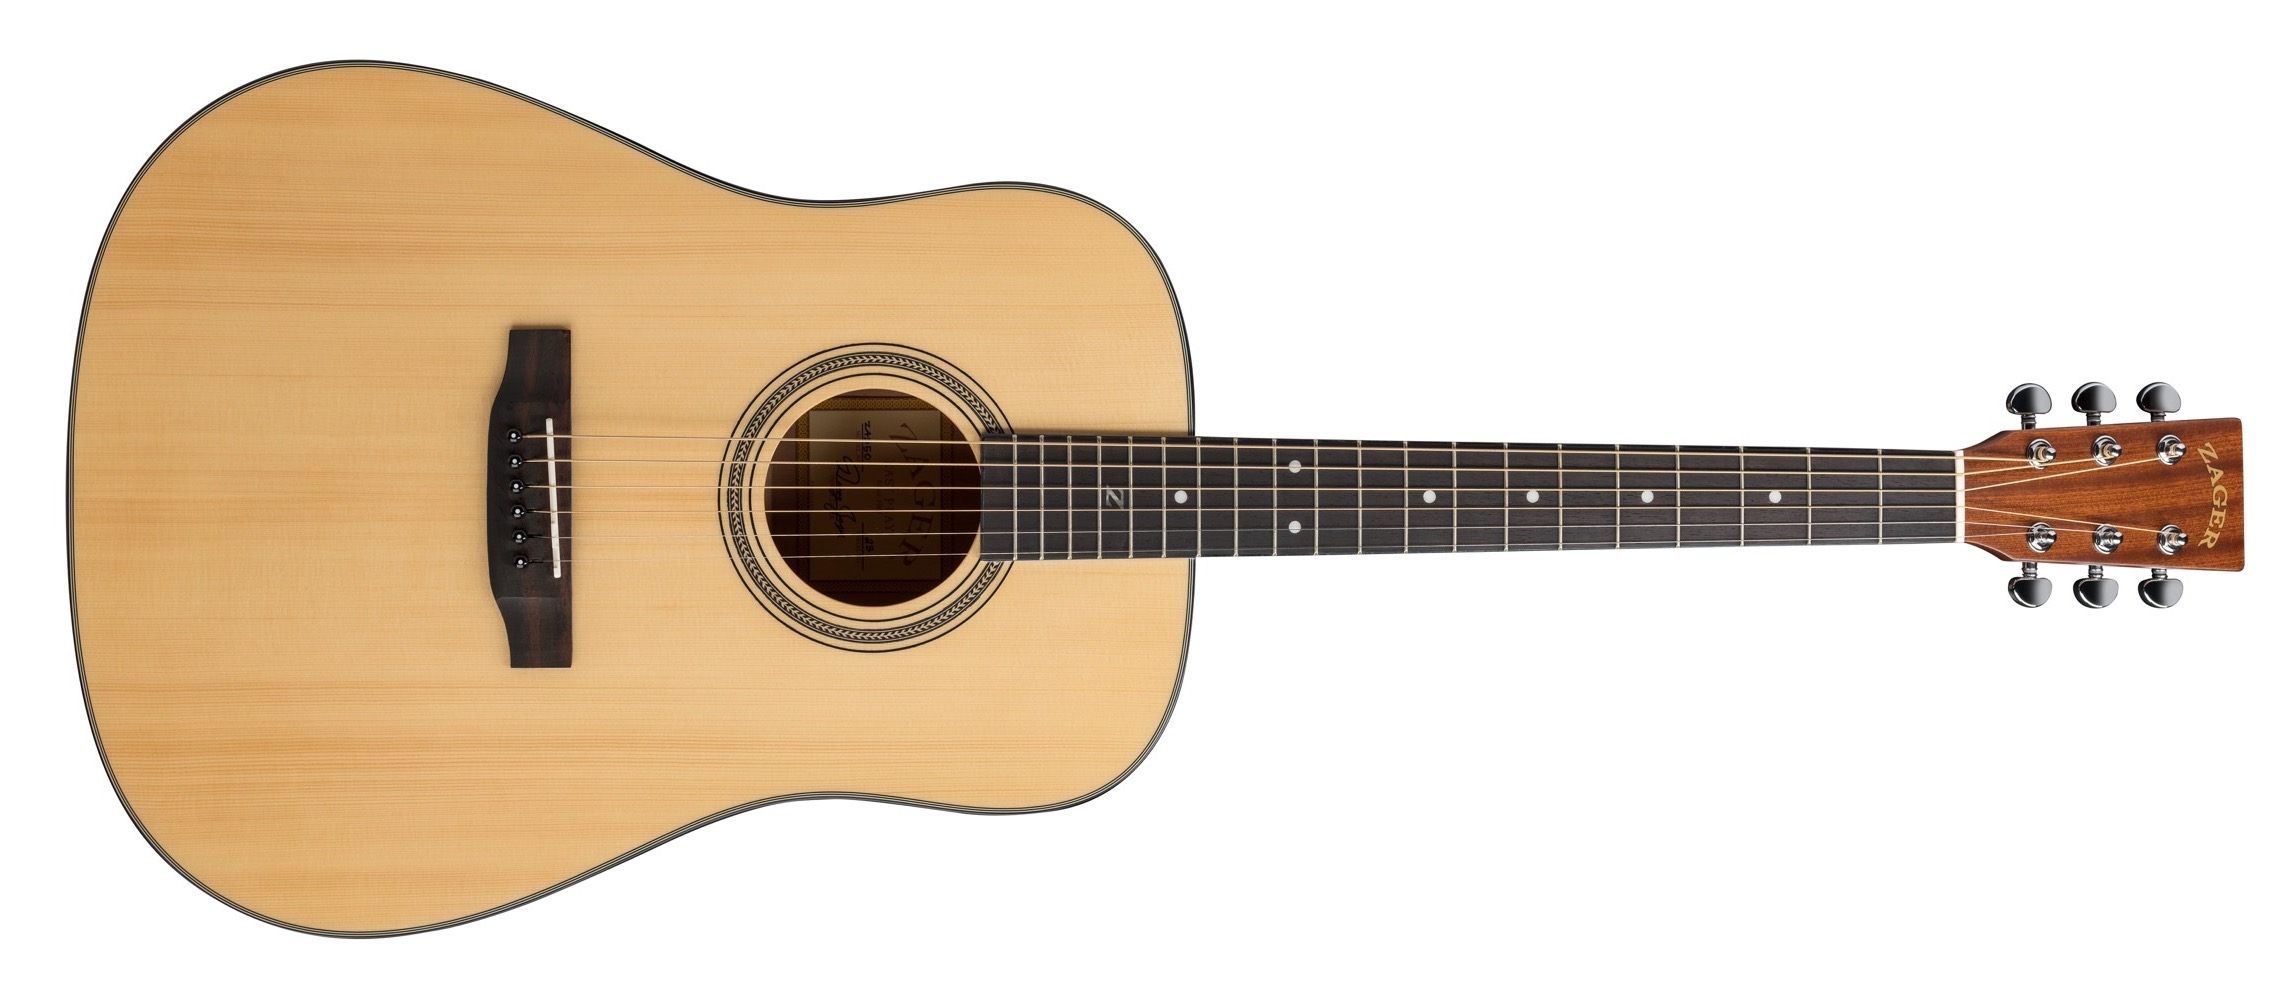 ZAD50 Solid Spruce Mahogany Acoustic